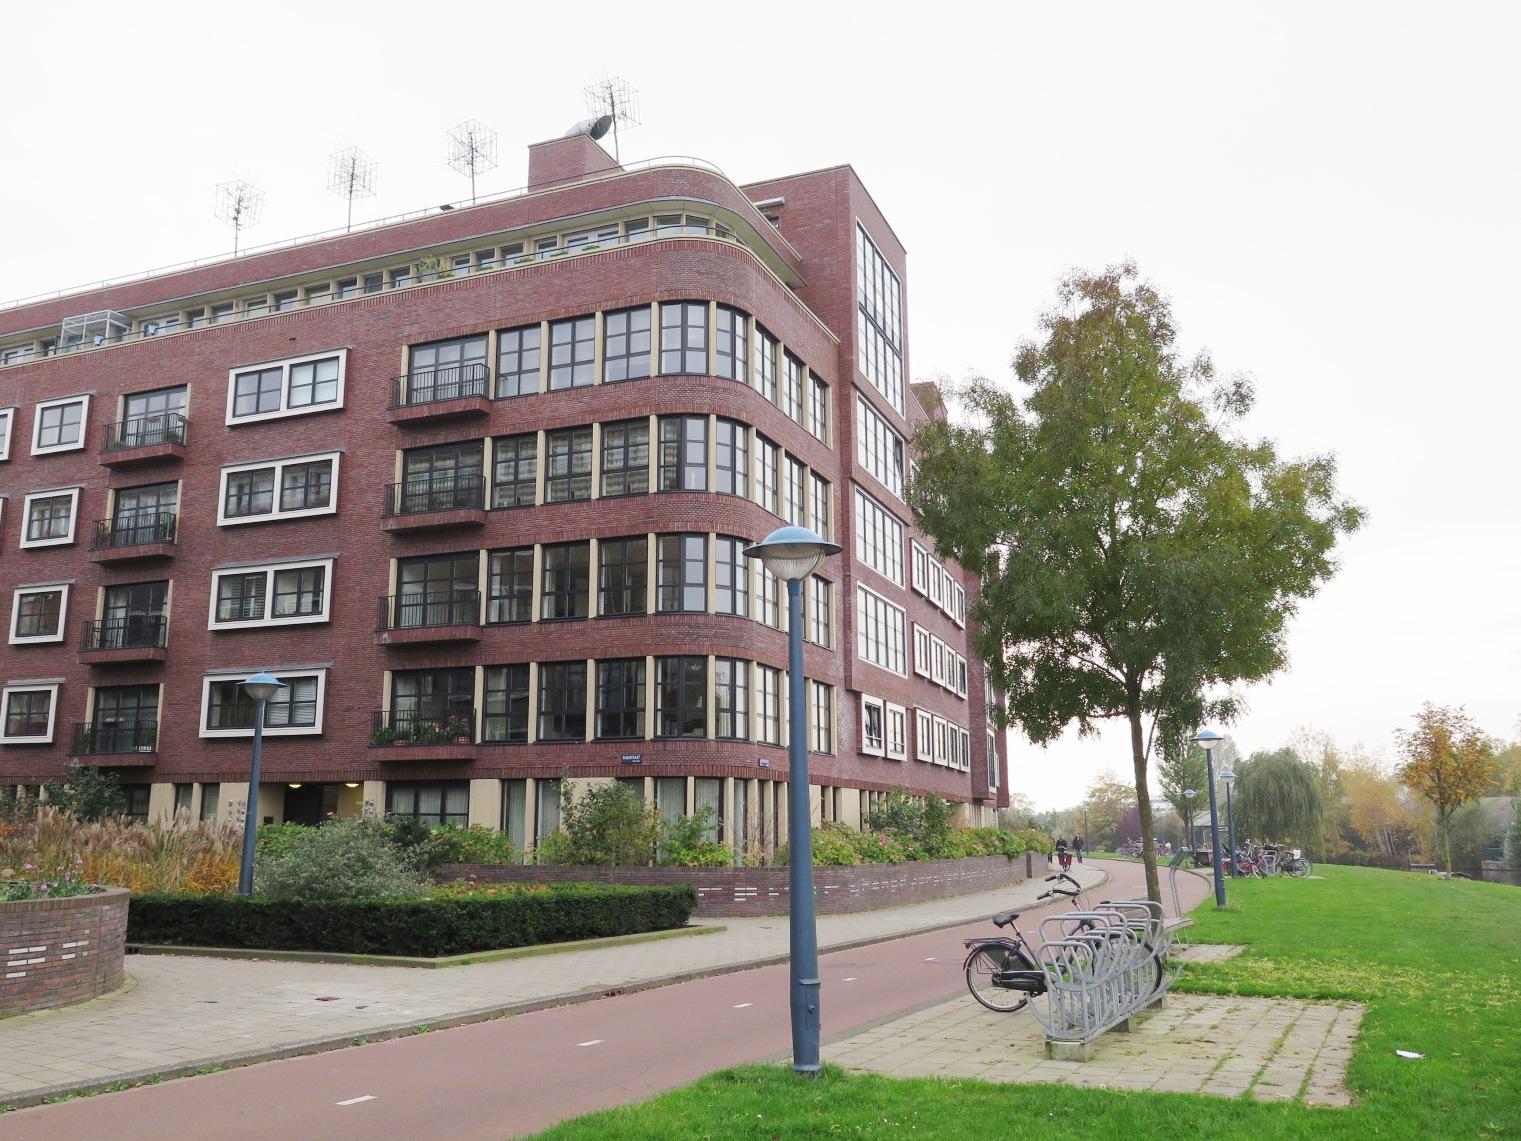 Rheastraat, Amsterdam